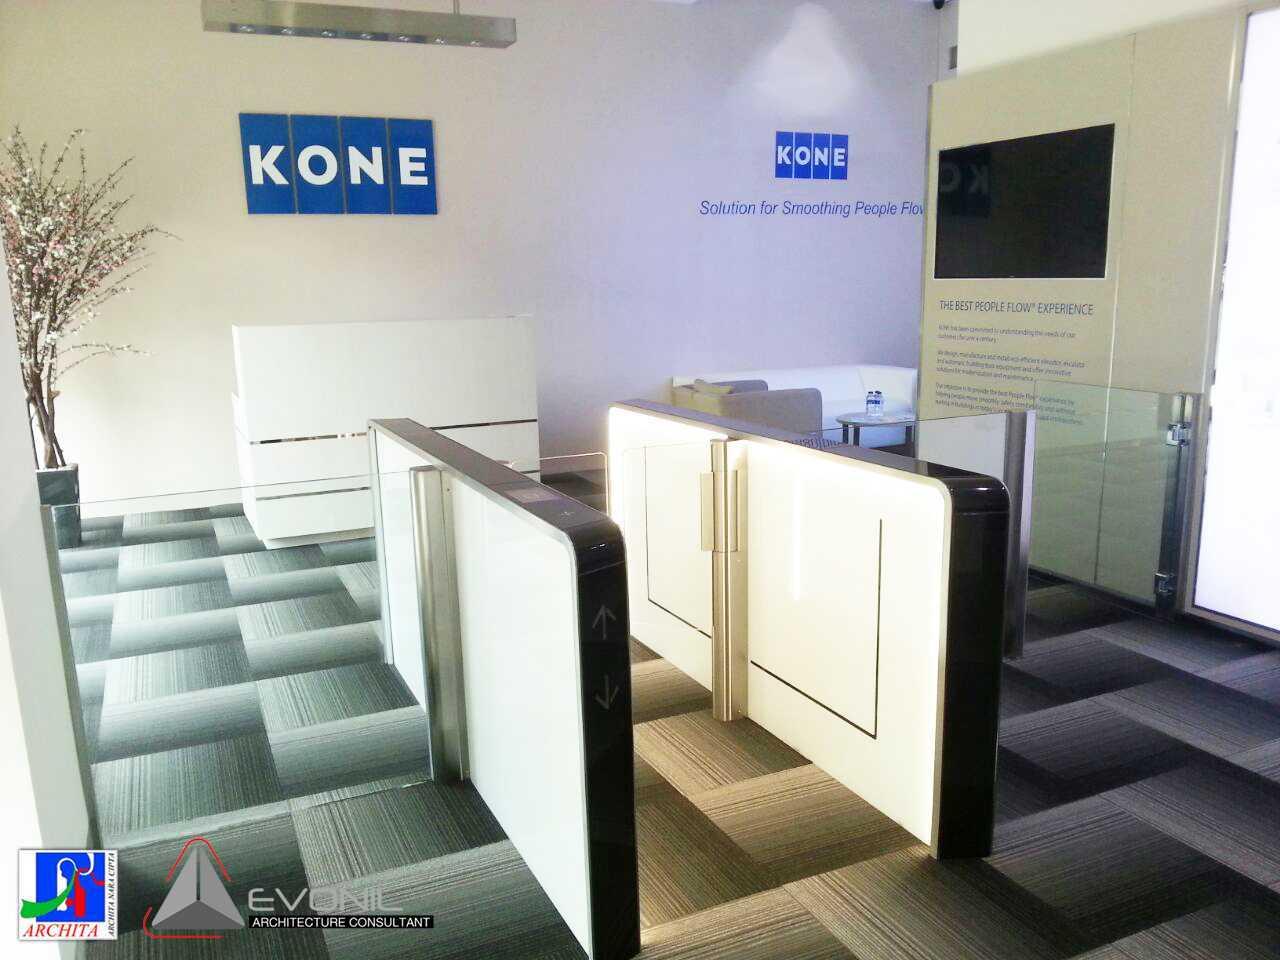 Evonil Architecture Kone Showroom & Training Center Kelapa Gading, Jakarta Kelapa Gading, Jakarta Kone-Showroom-Area-8-2 Modern  13180